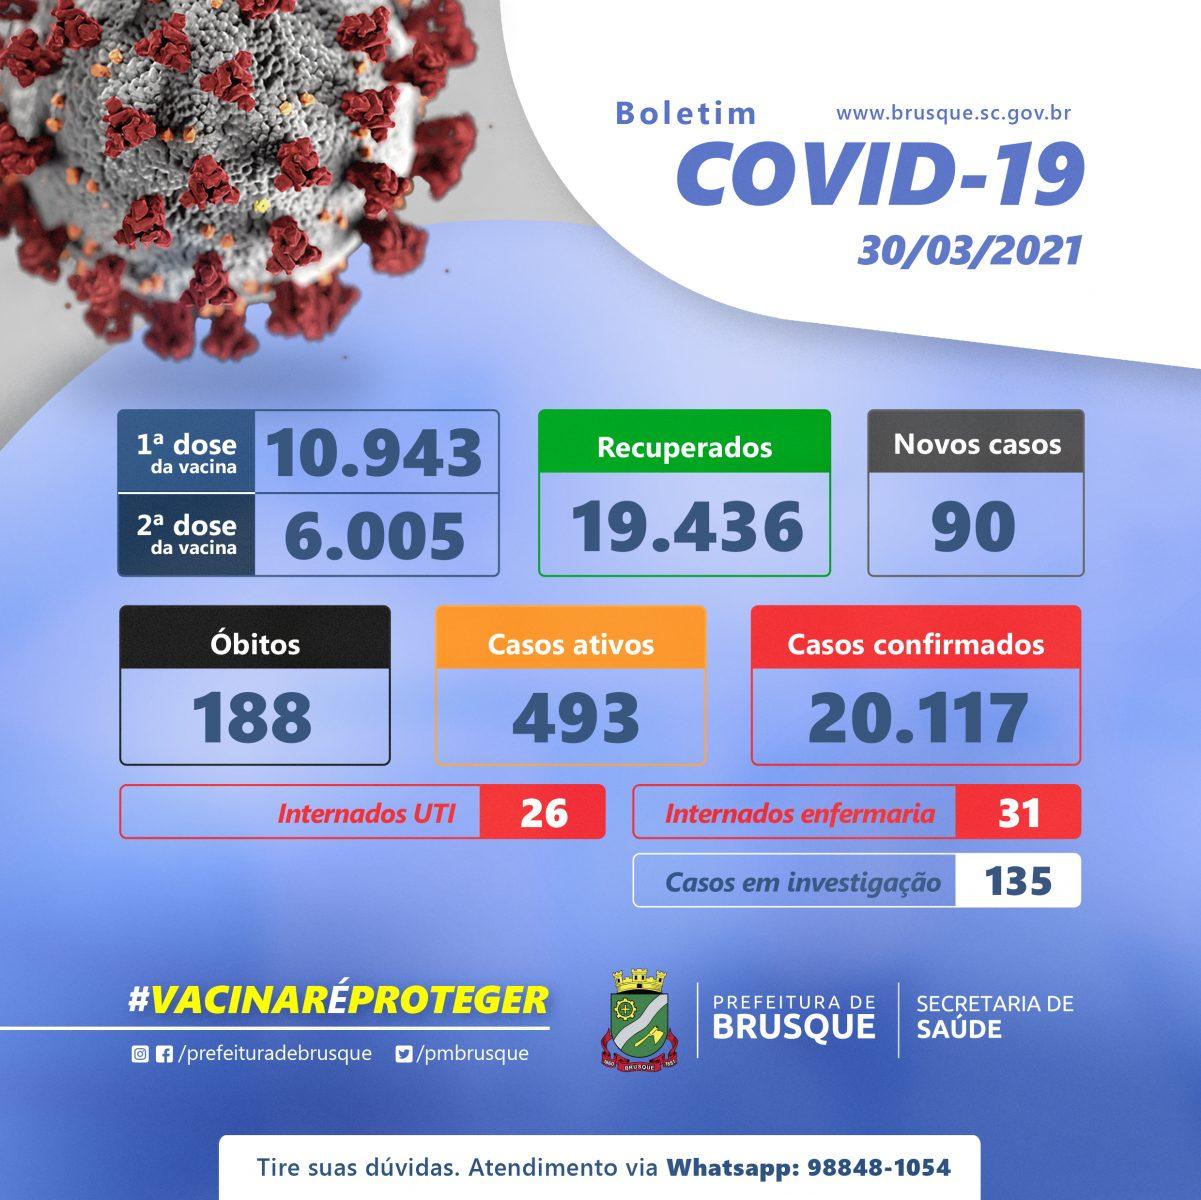 Covid-19: Confira o boletim epidemiológico desta terça-feira (30)